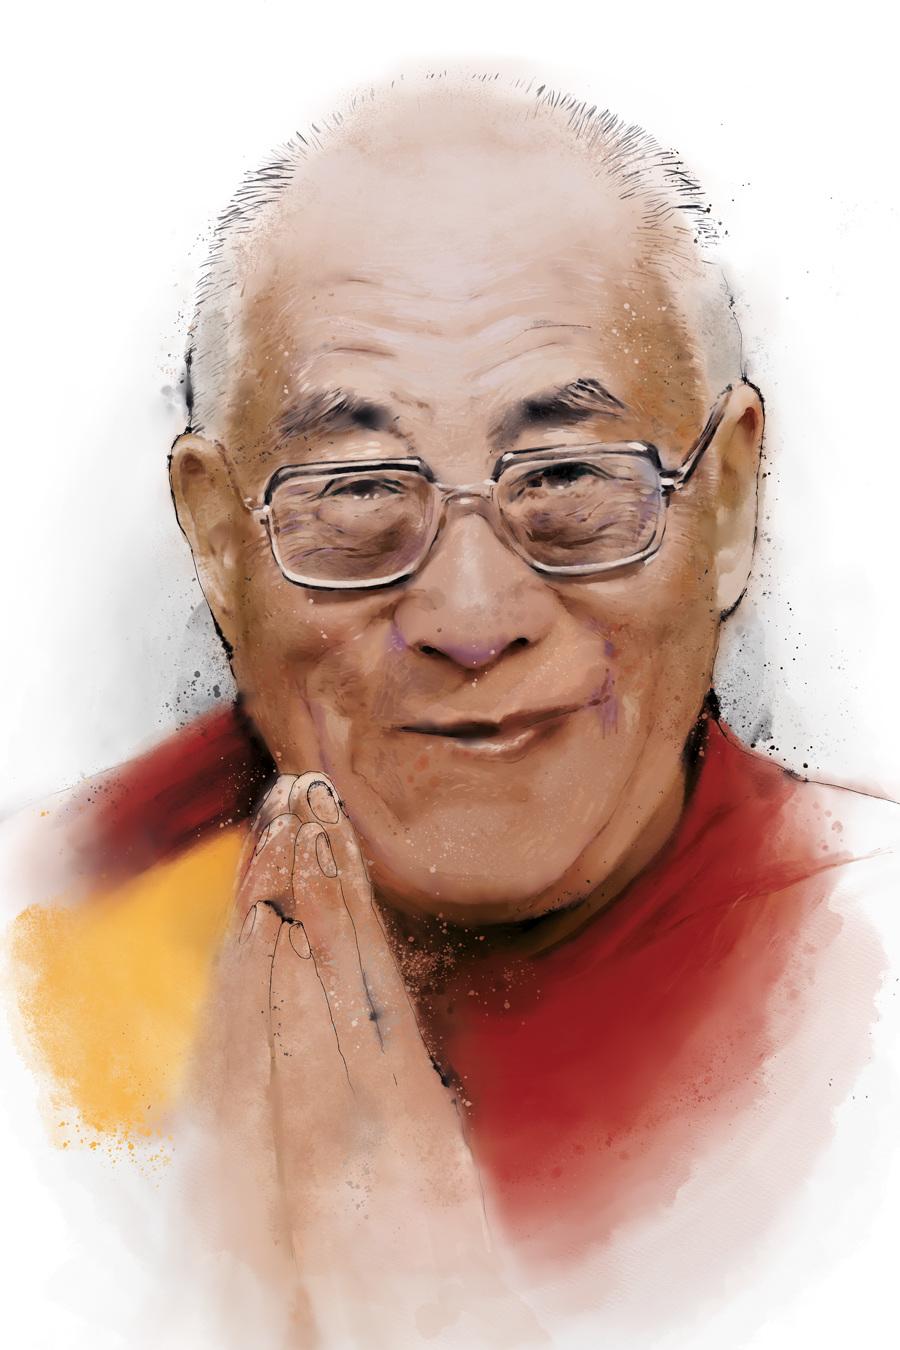 Dalai Lama Egon Von Euwensz German Graffiti Artist Egon Von Euwensz